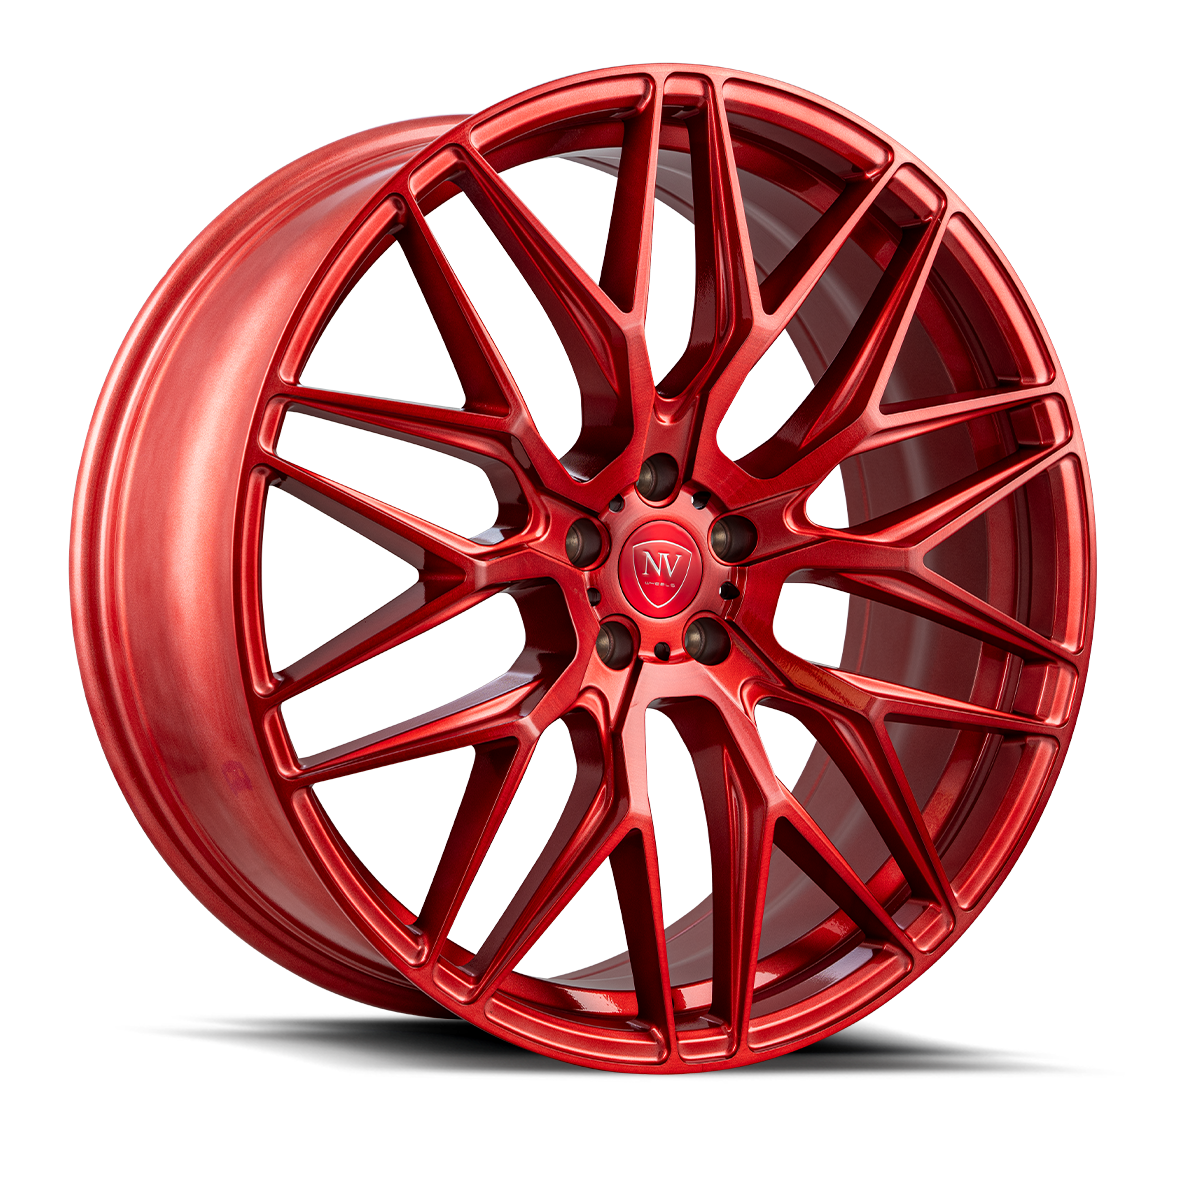 NV1 Brushed Red